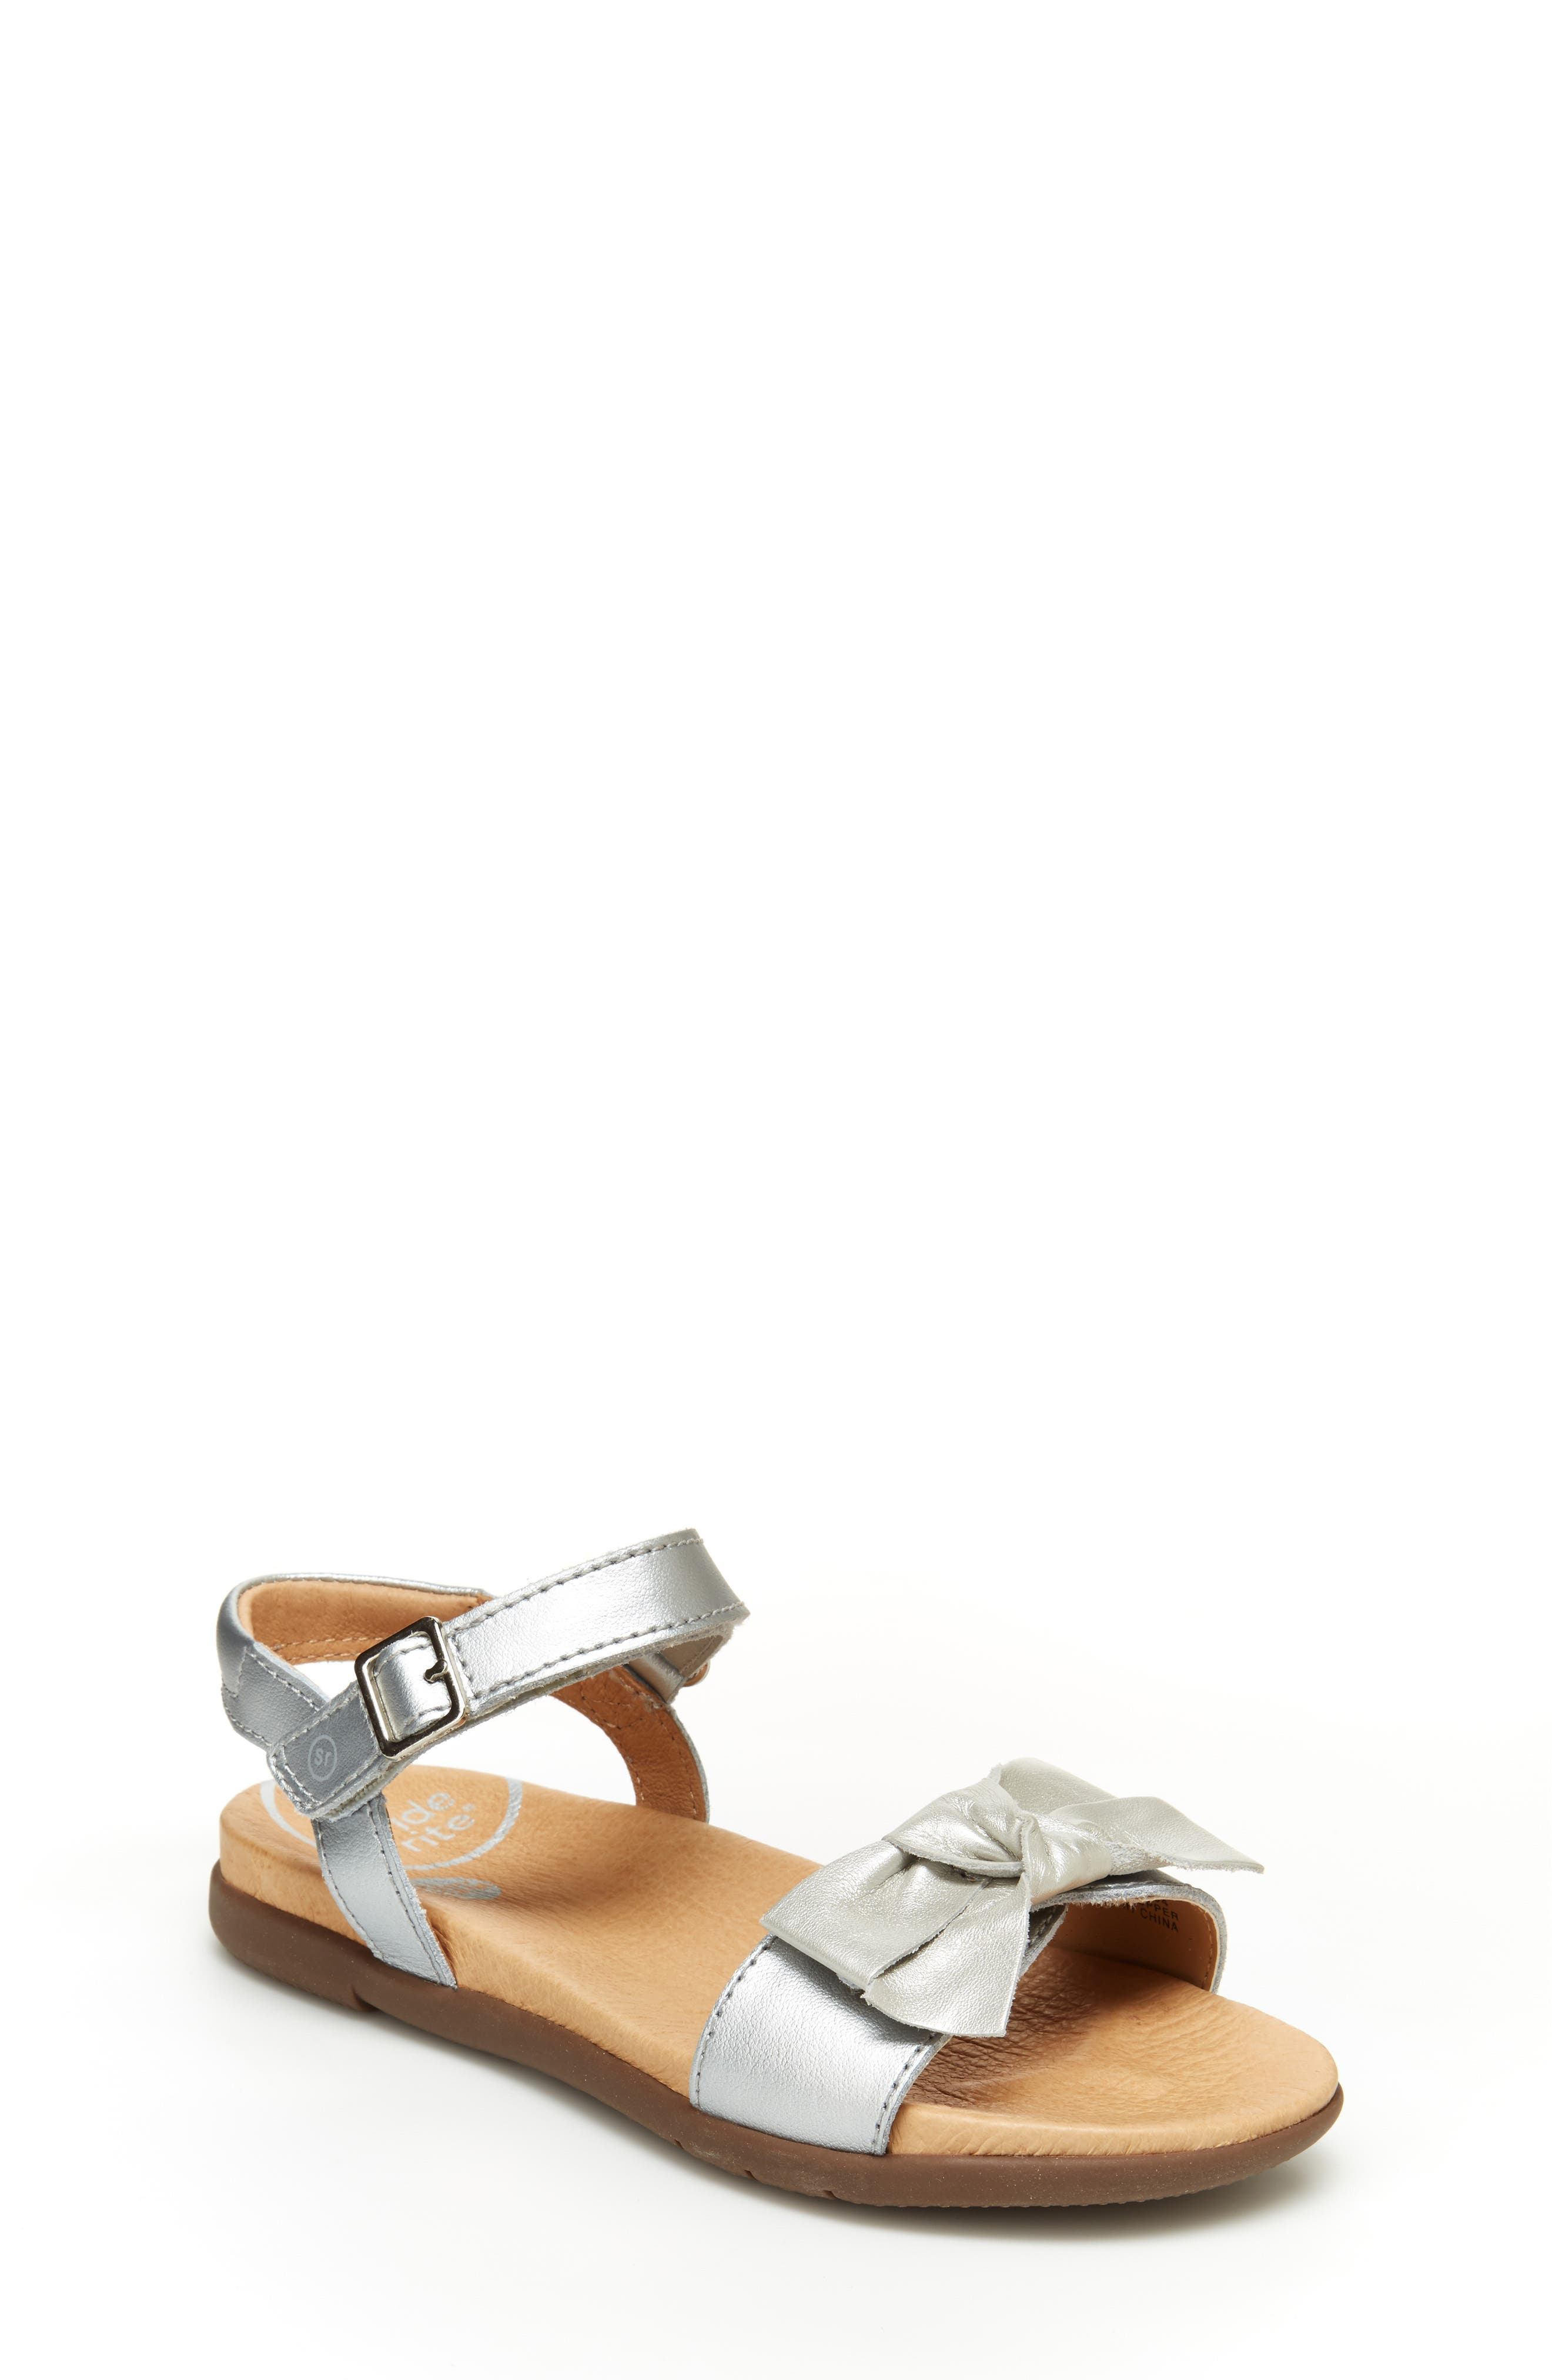 Girls Stride Rite Srtech(TM) Savannah Sandal Size 1 M  Metallic